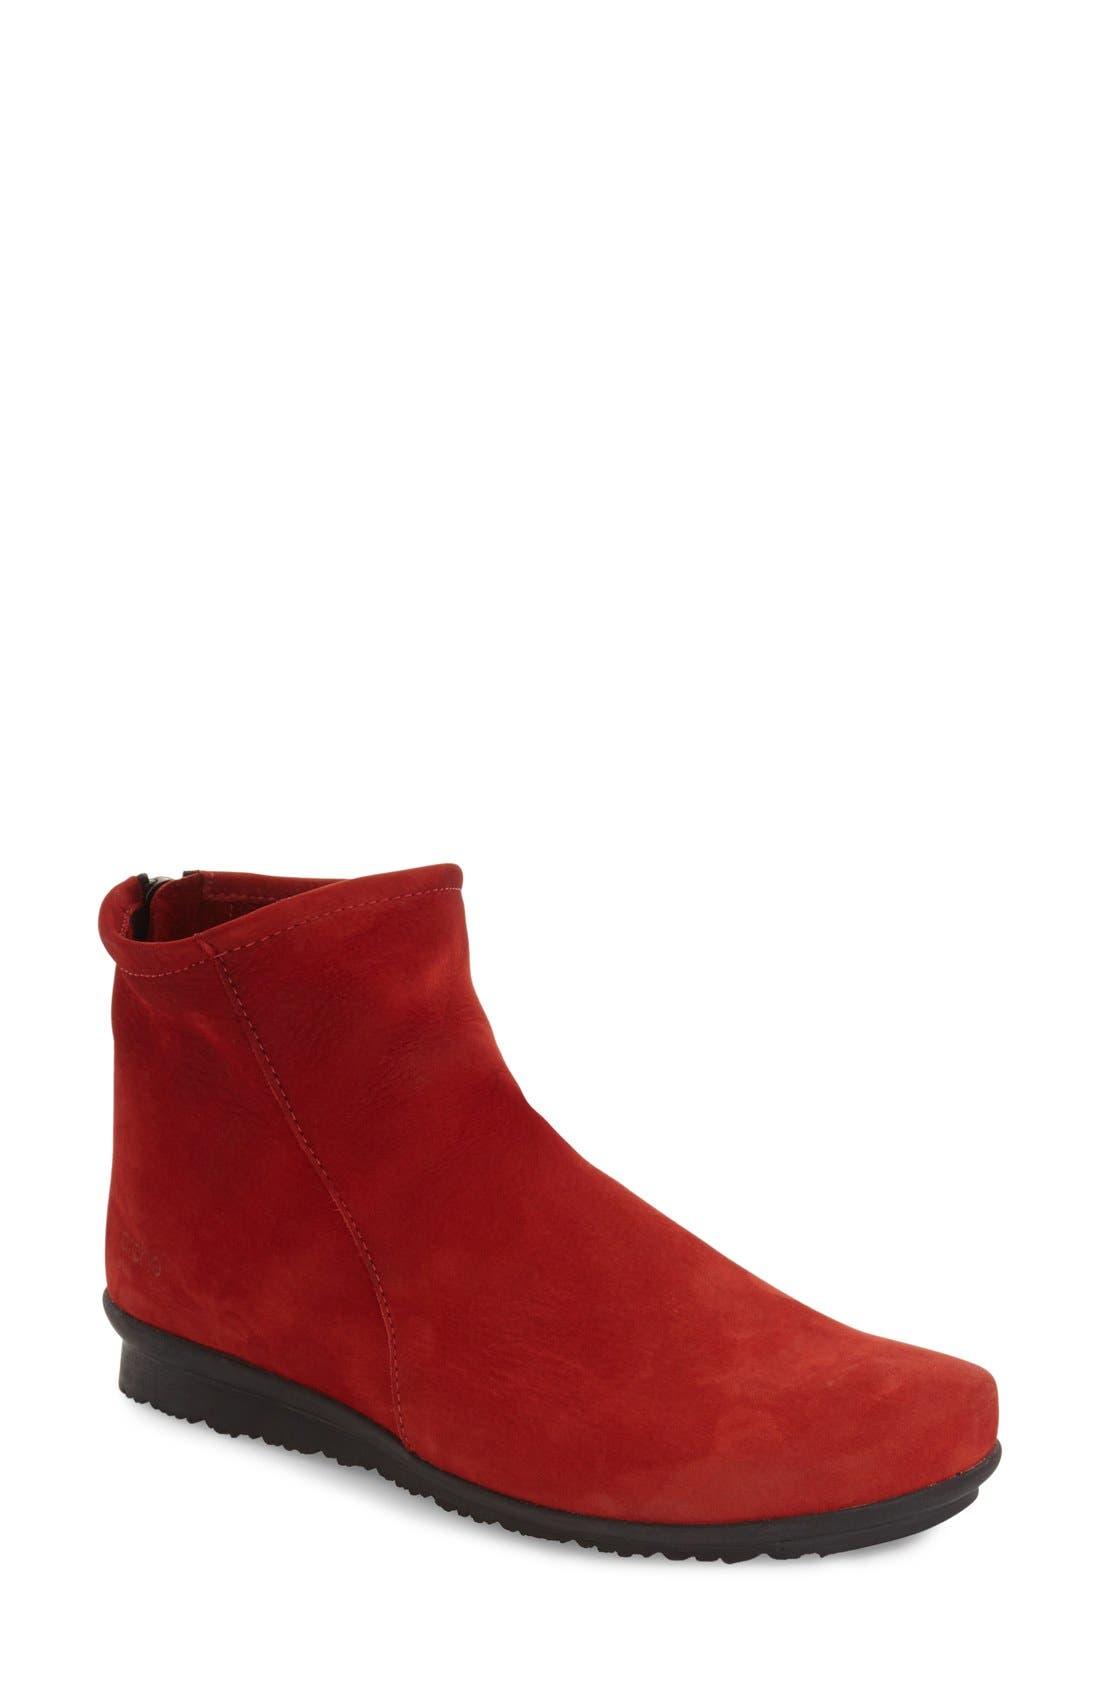 Main Image - Arche 'Baryky' Boot